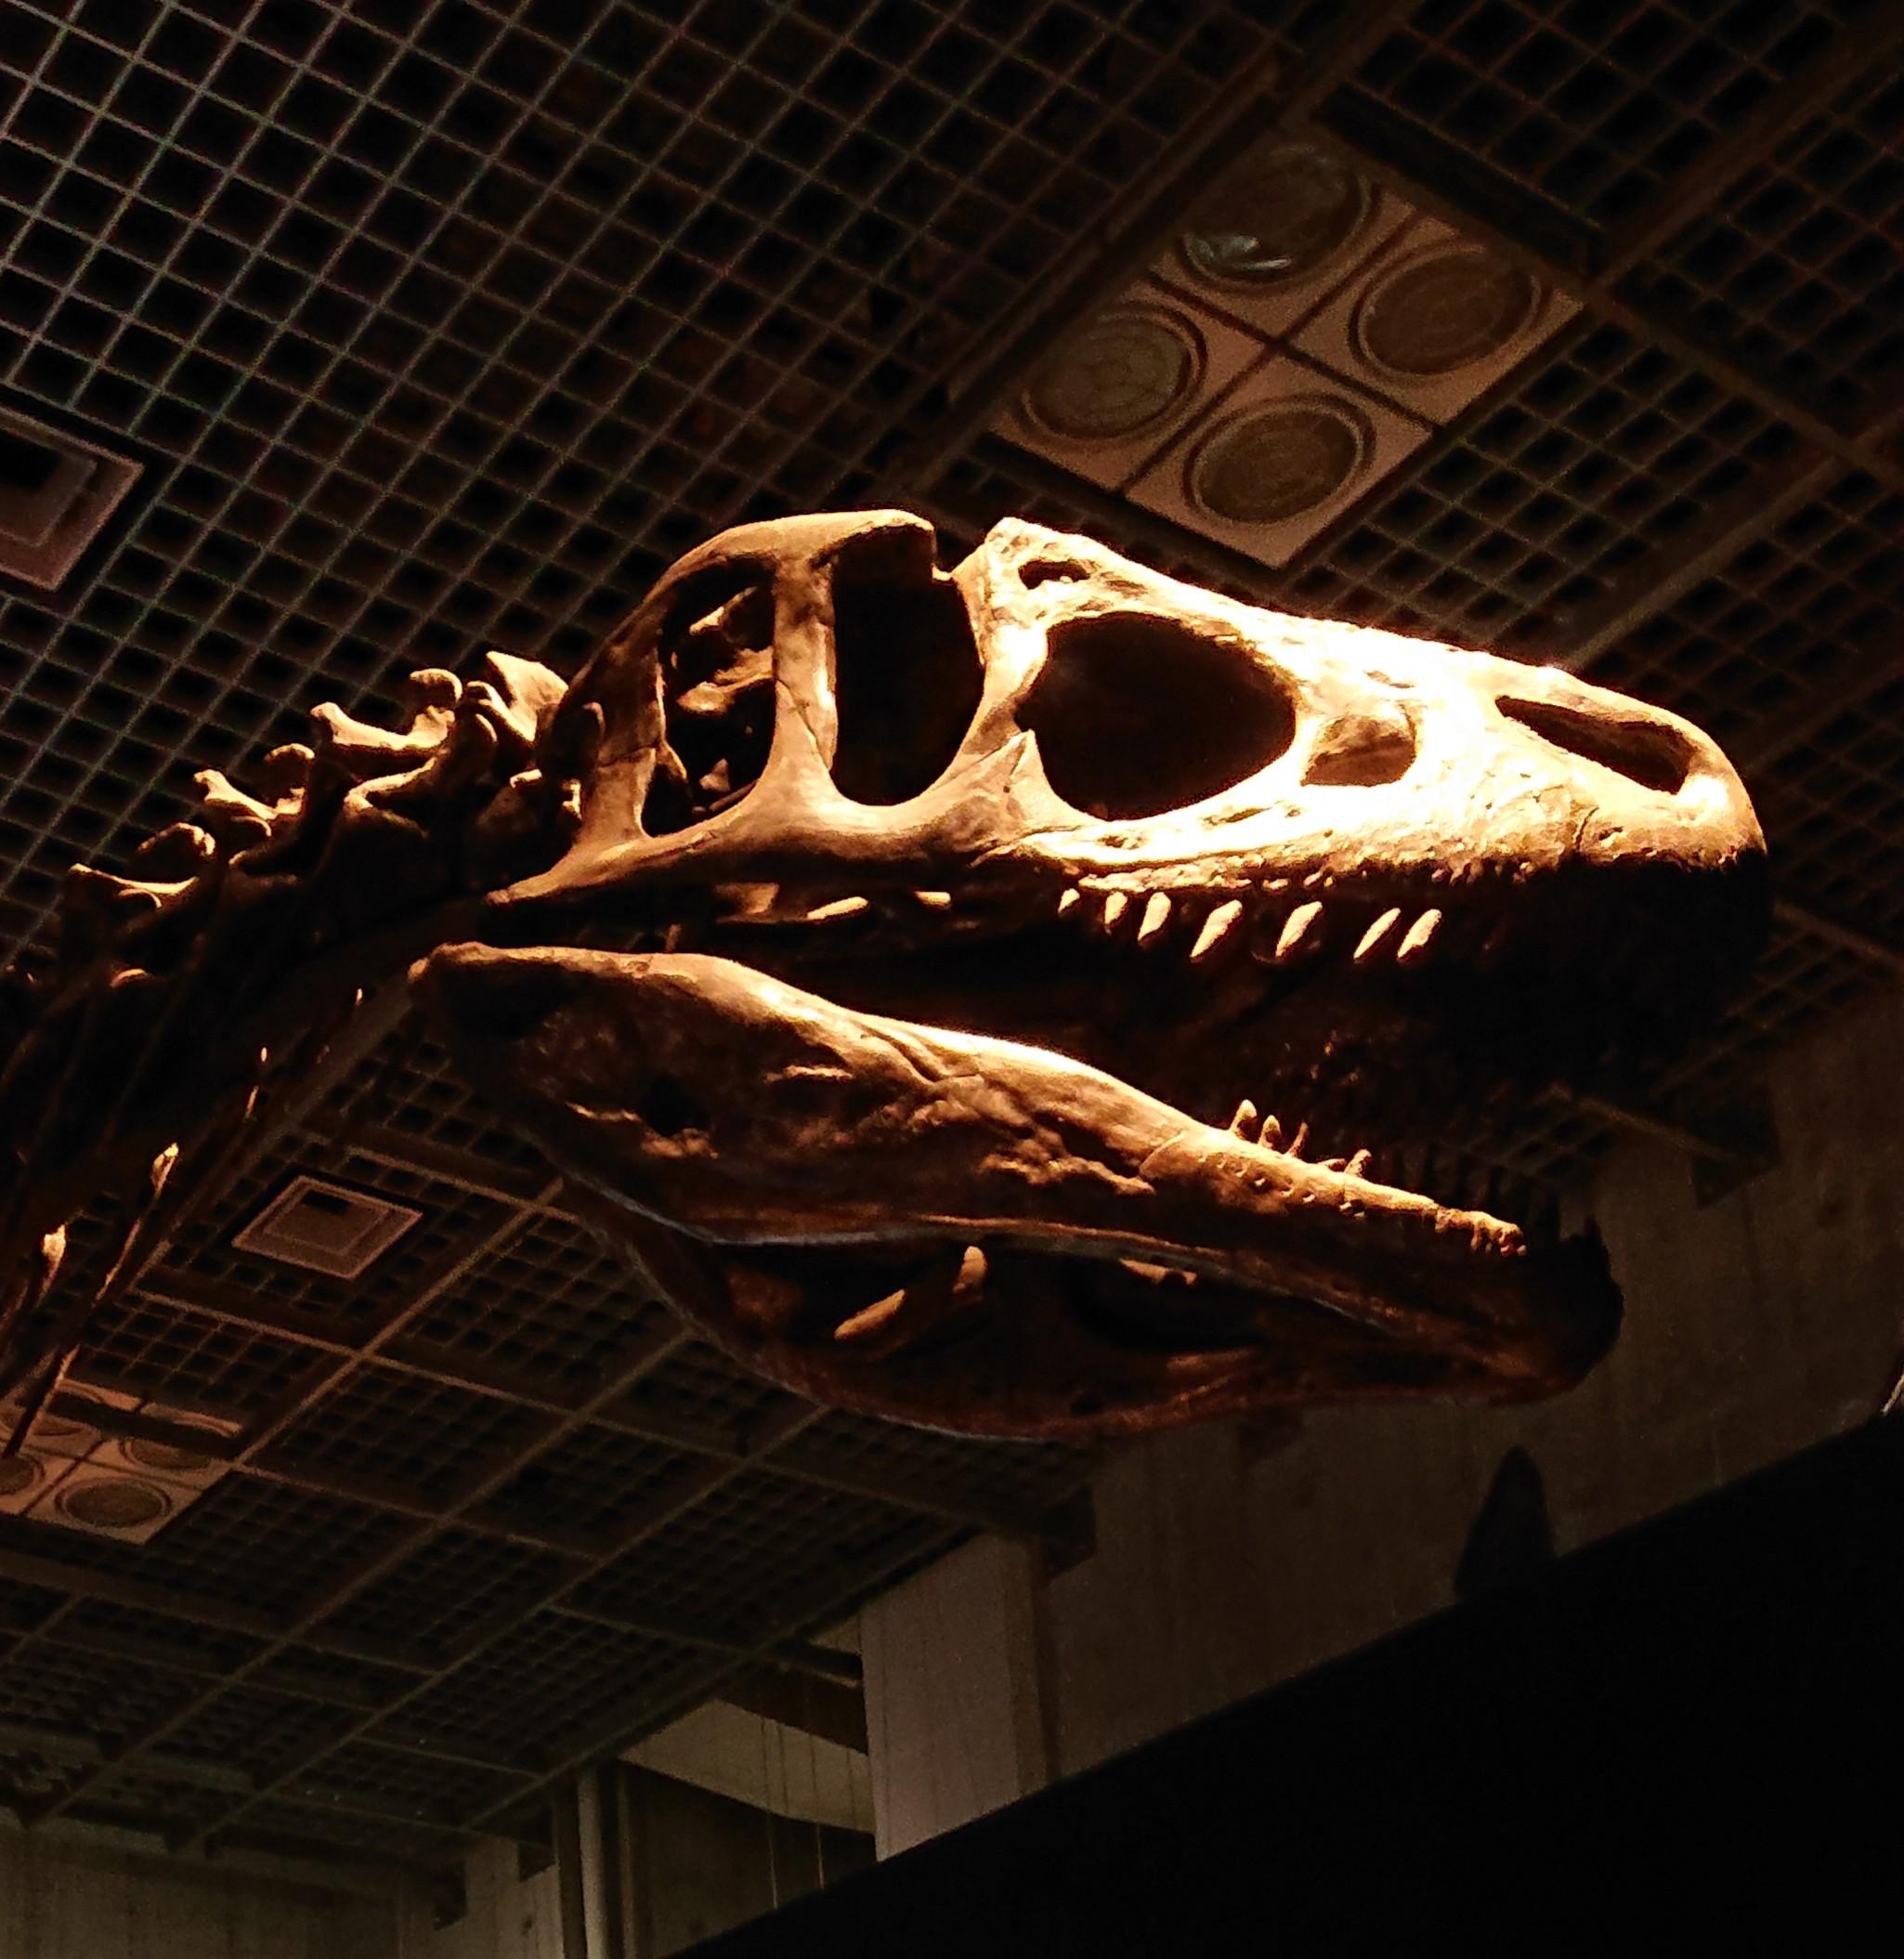 File1:上野アロサウルス事情